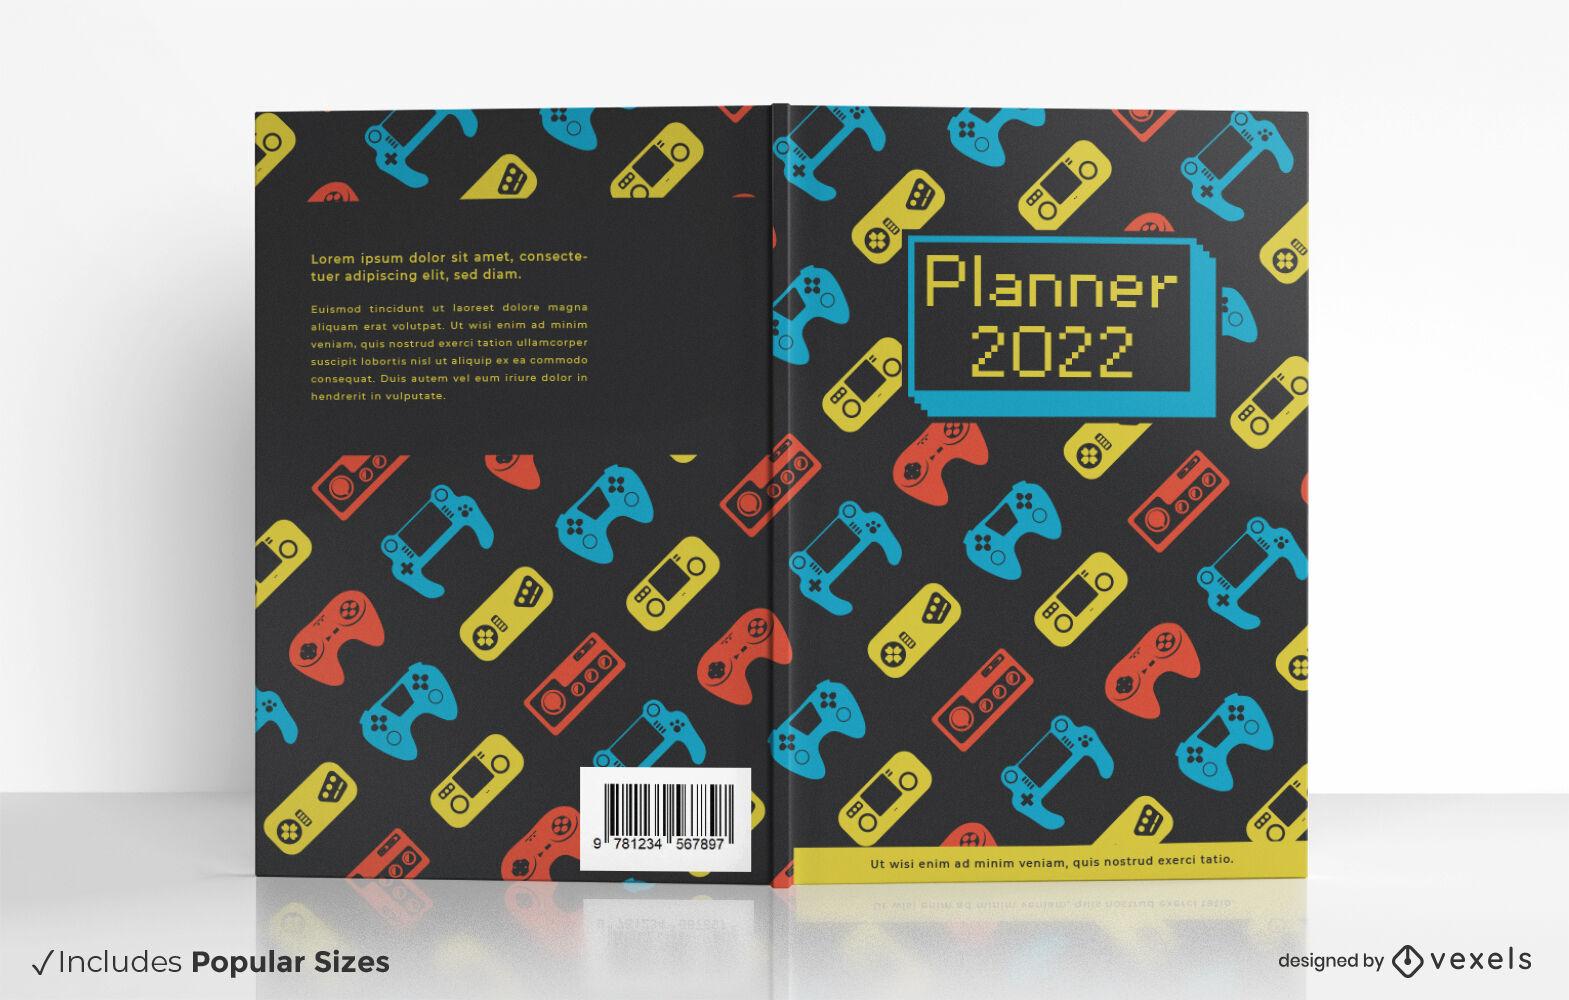 Joystick-Videospiele-Buchcover-Design